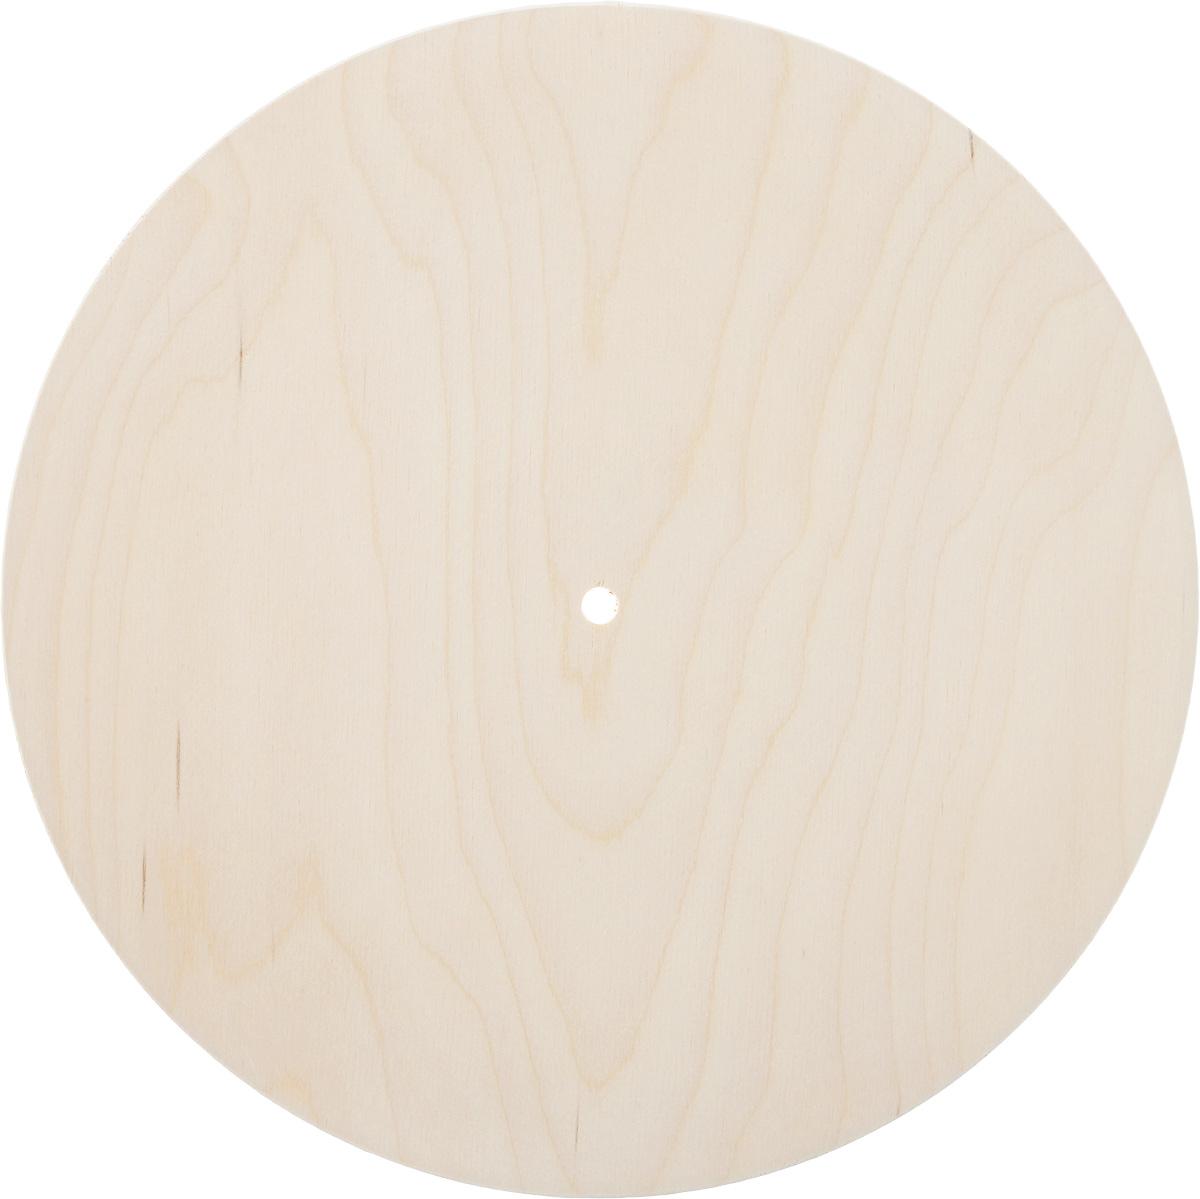 Zakazat.ru: Заготовка деревянная Decoriton Основа под часы №1, 28 х 1,2 x 0,9 см